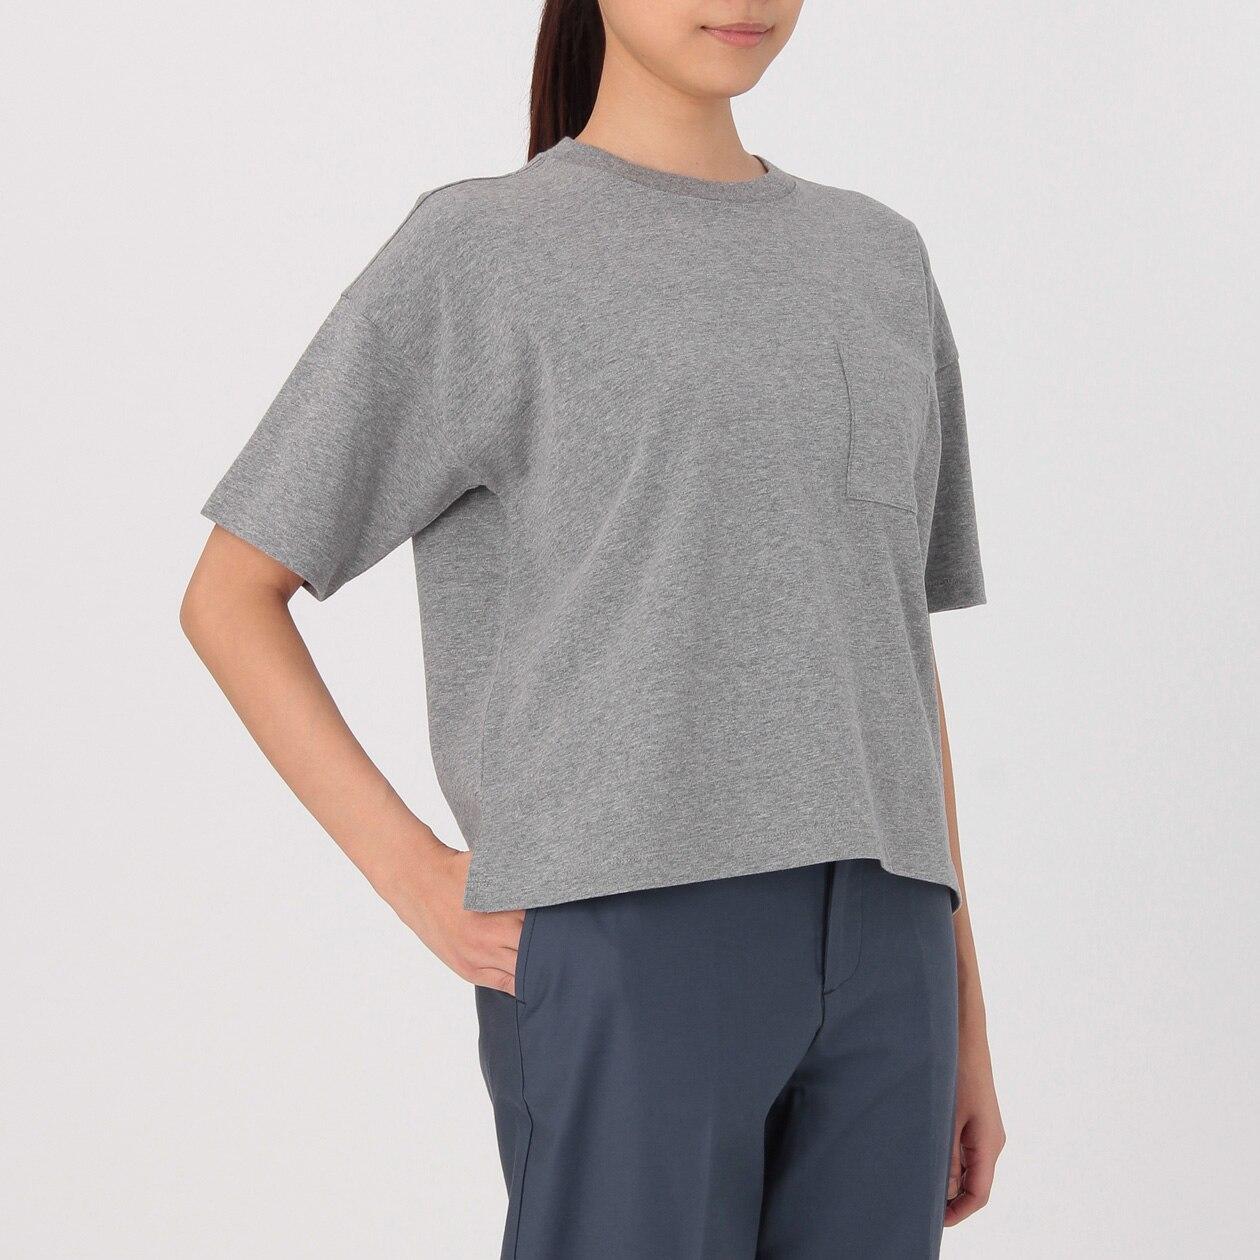 ogc low count s s t shirt muji. Black Bedroom Furniture Sets. Home Design Ideas